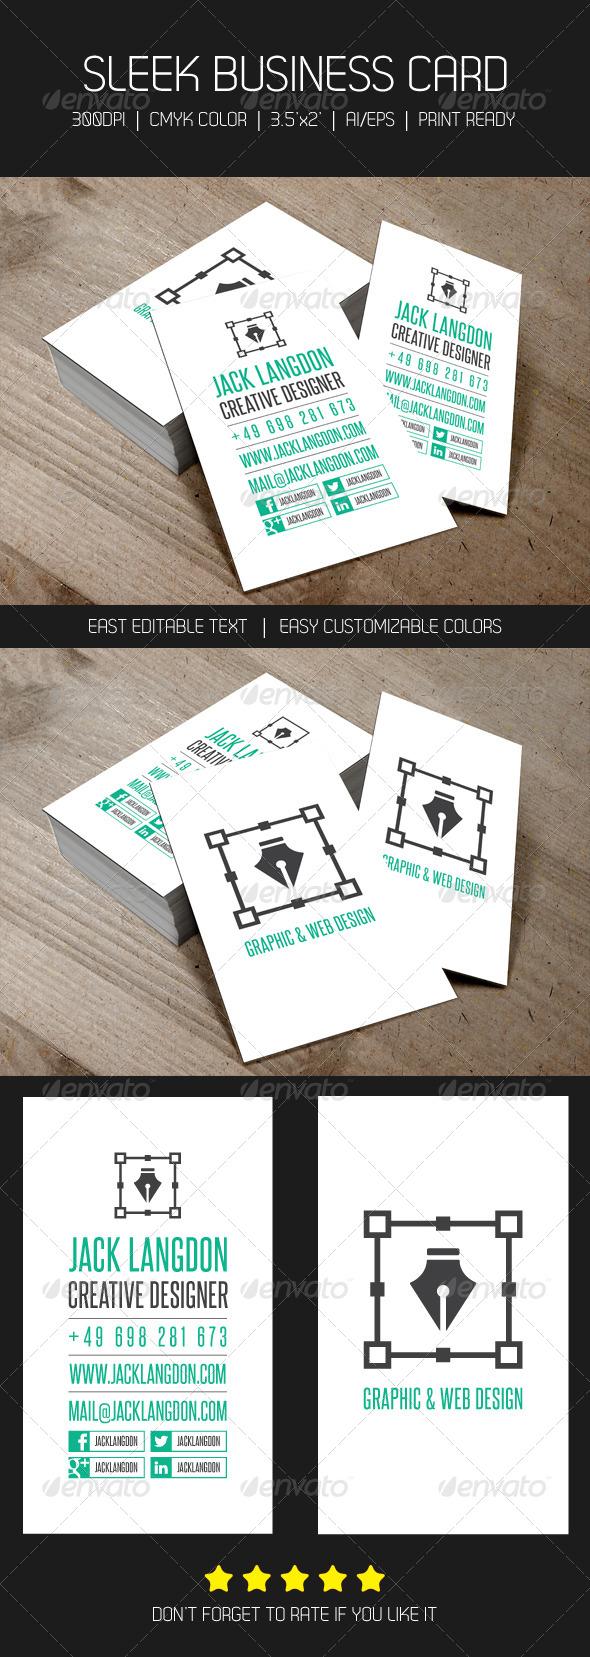 GraphicRiver Sleek & Creative Business Card 4735010